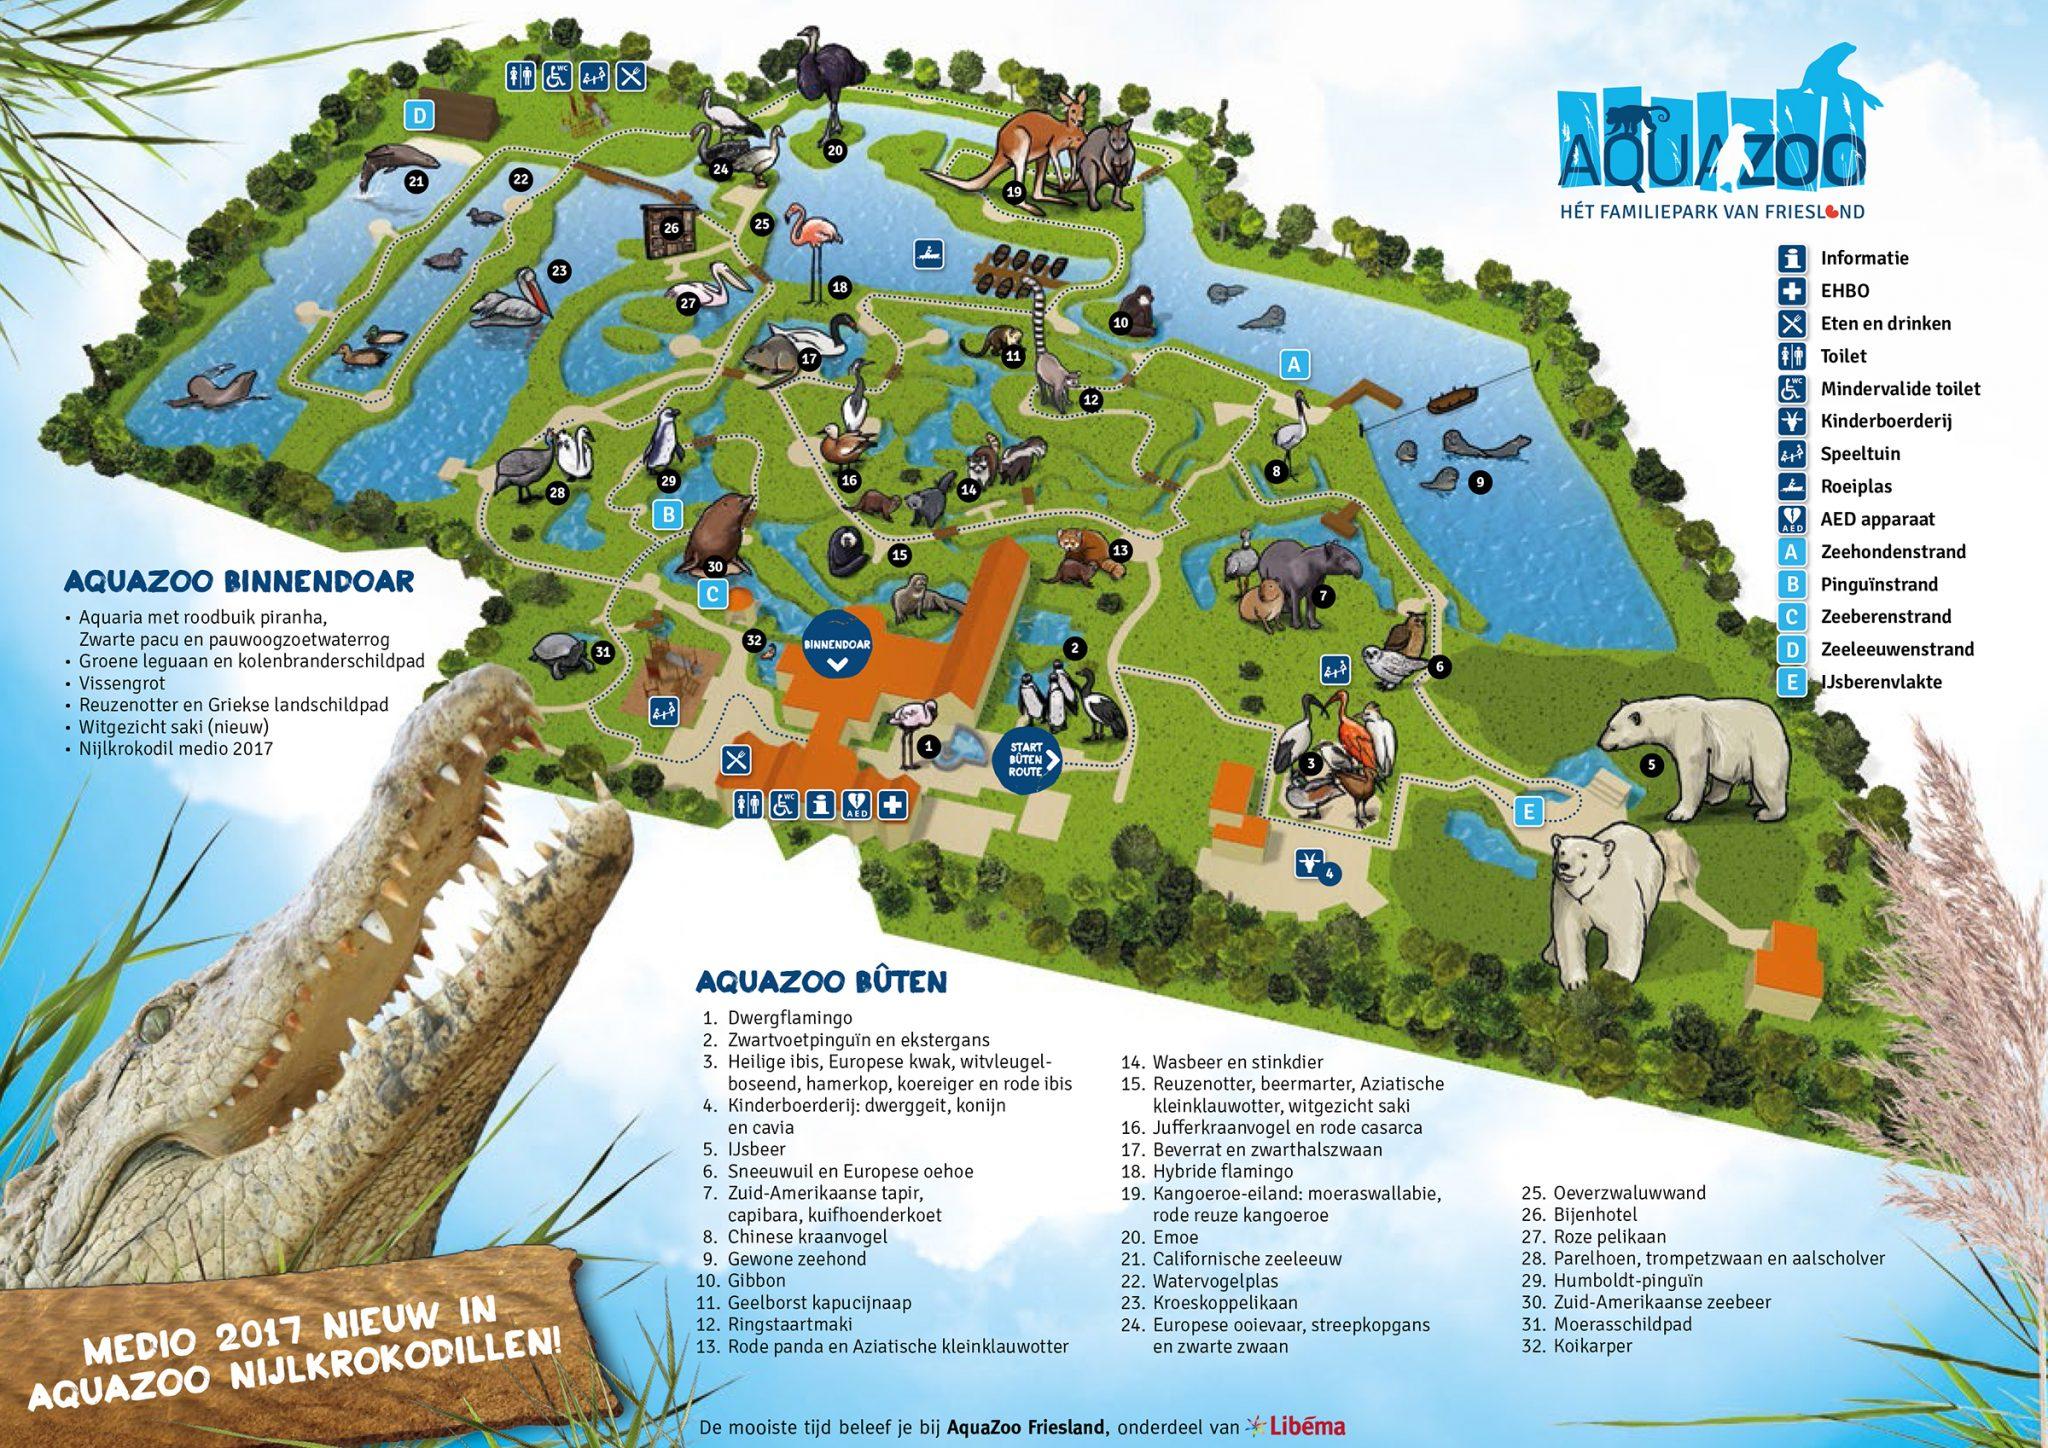 Plattegrond Aquazoo H 233 T Familiepark Van Friesland